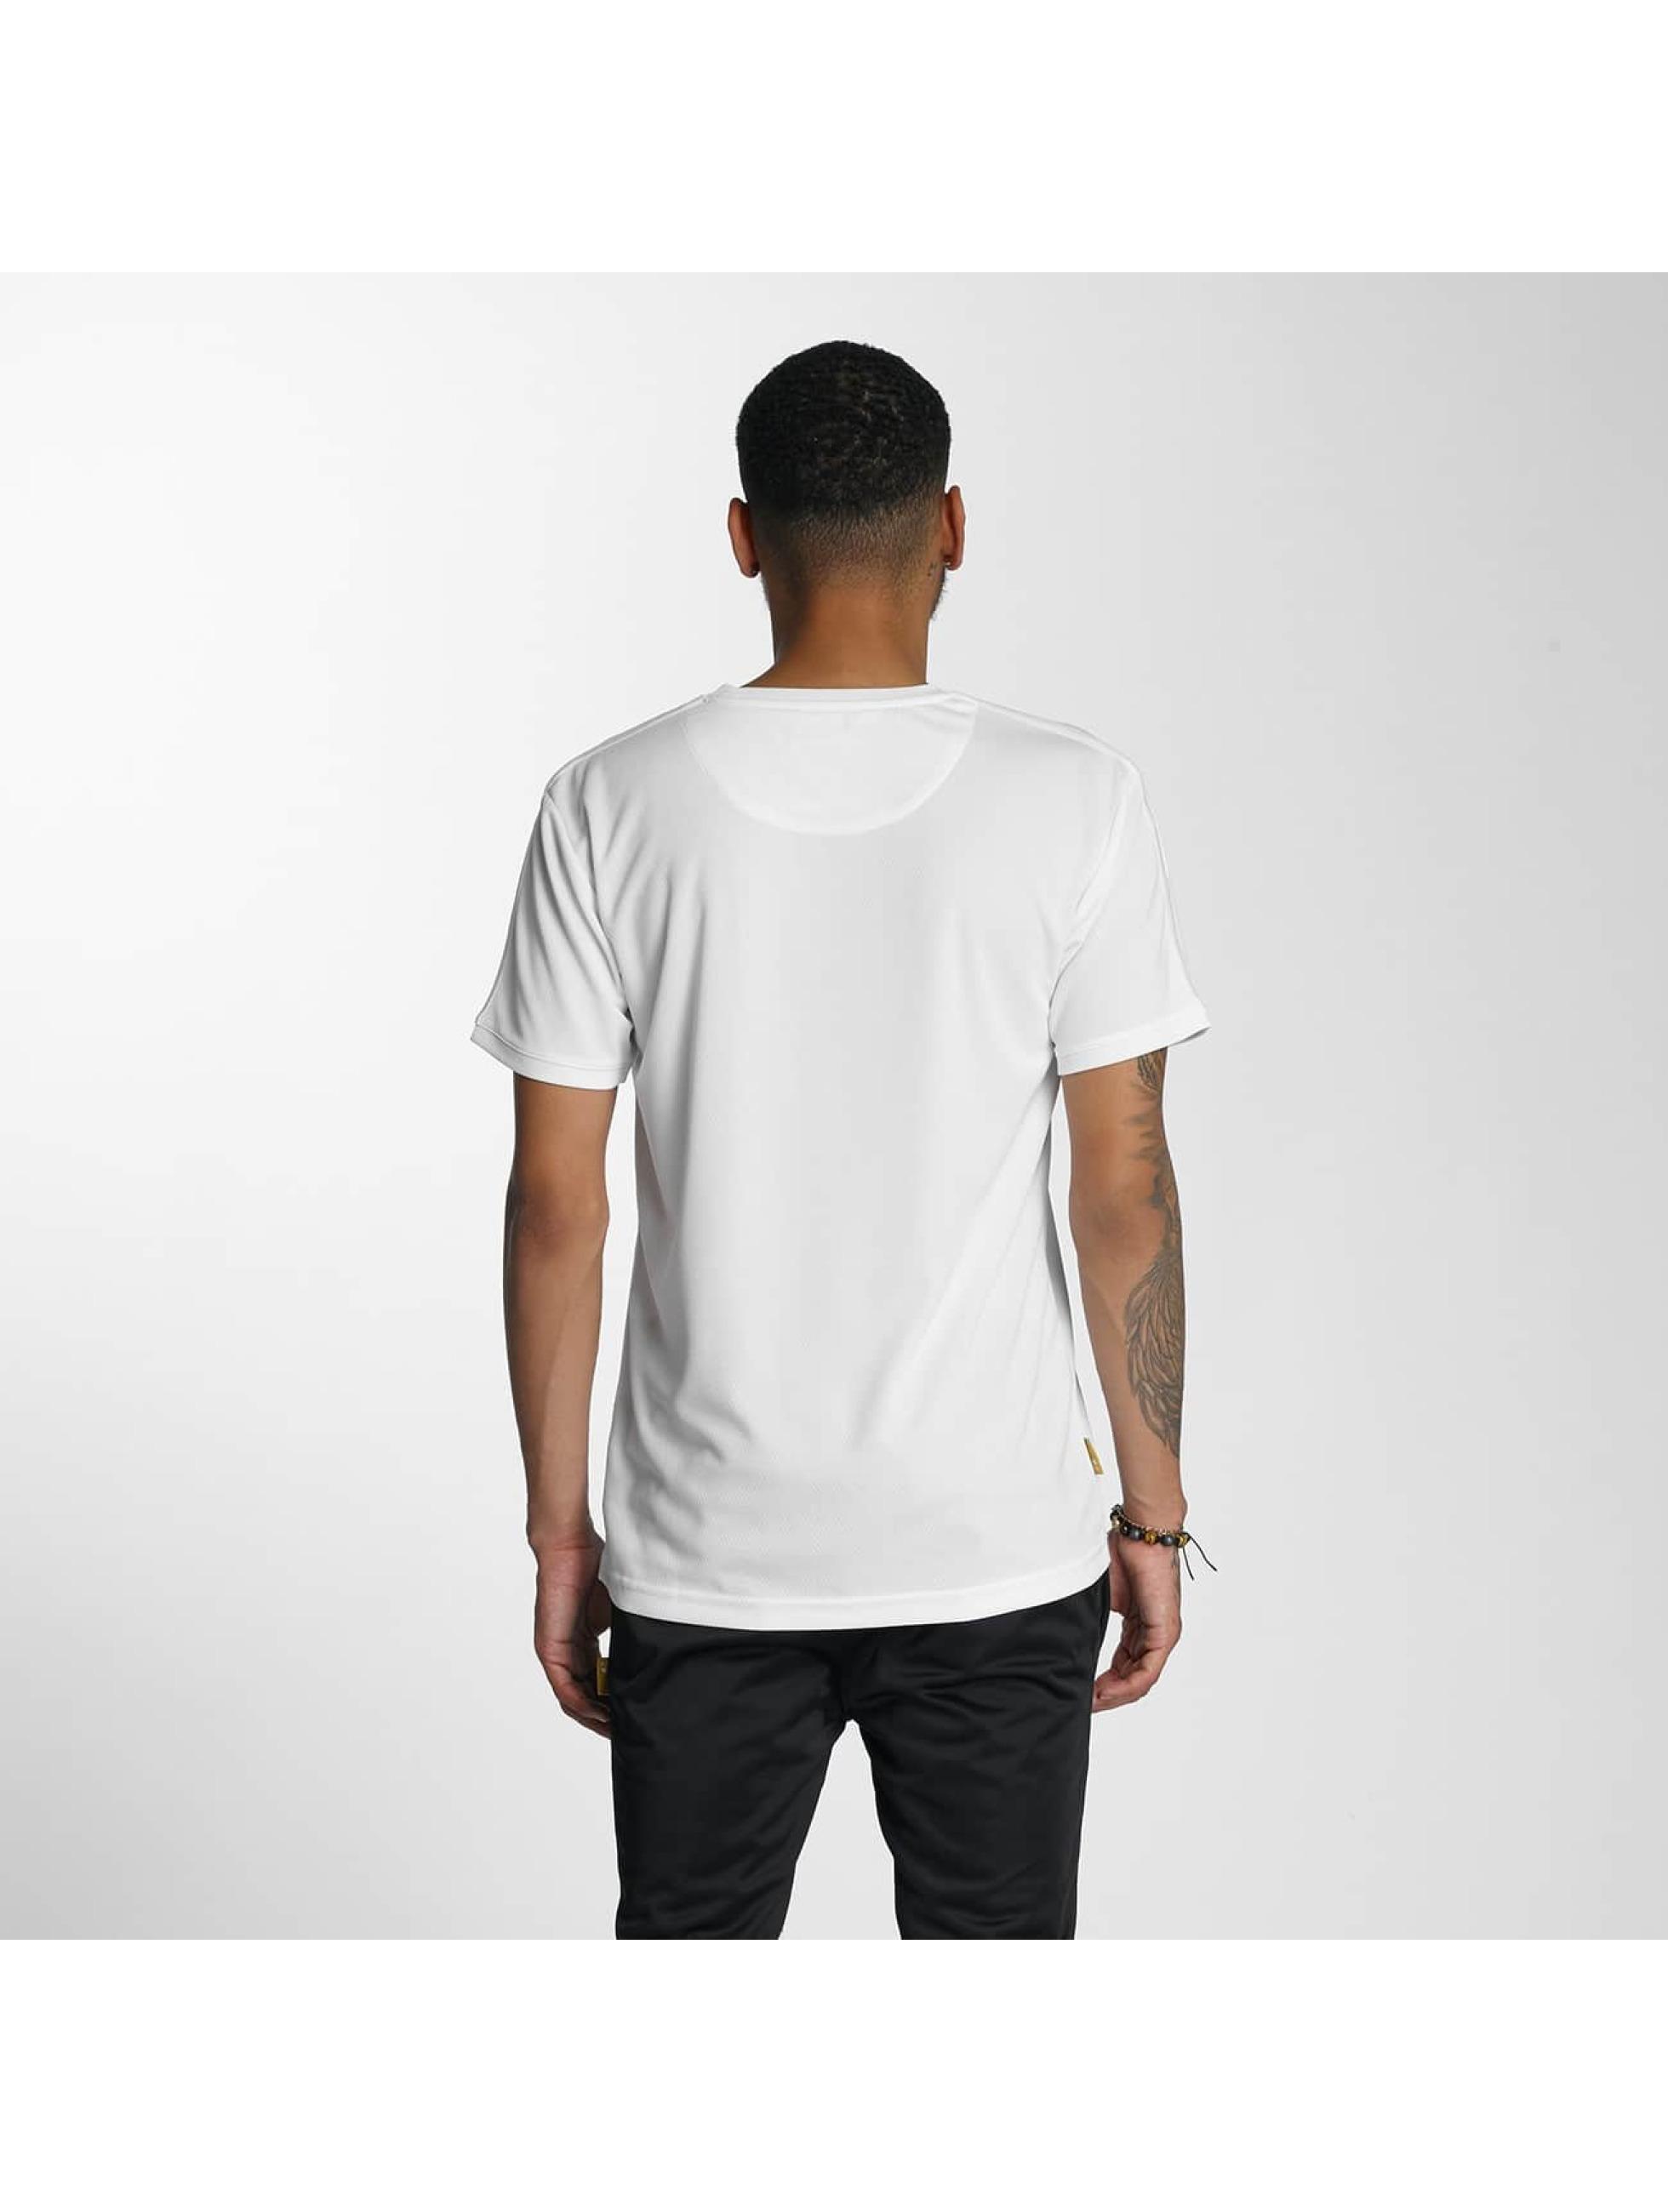 CHABOS IIVII t-shirt Bianci Soccer wit